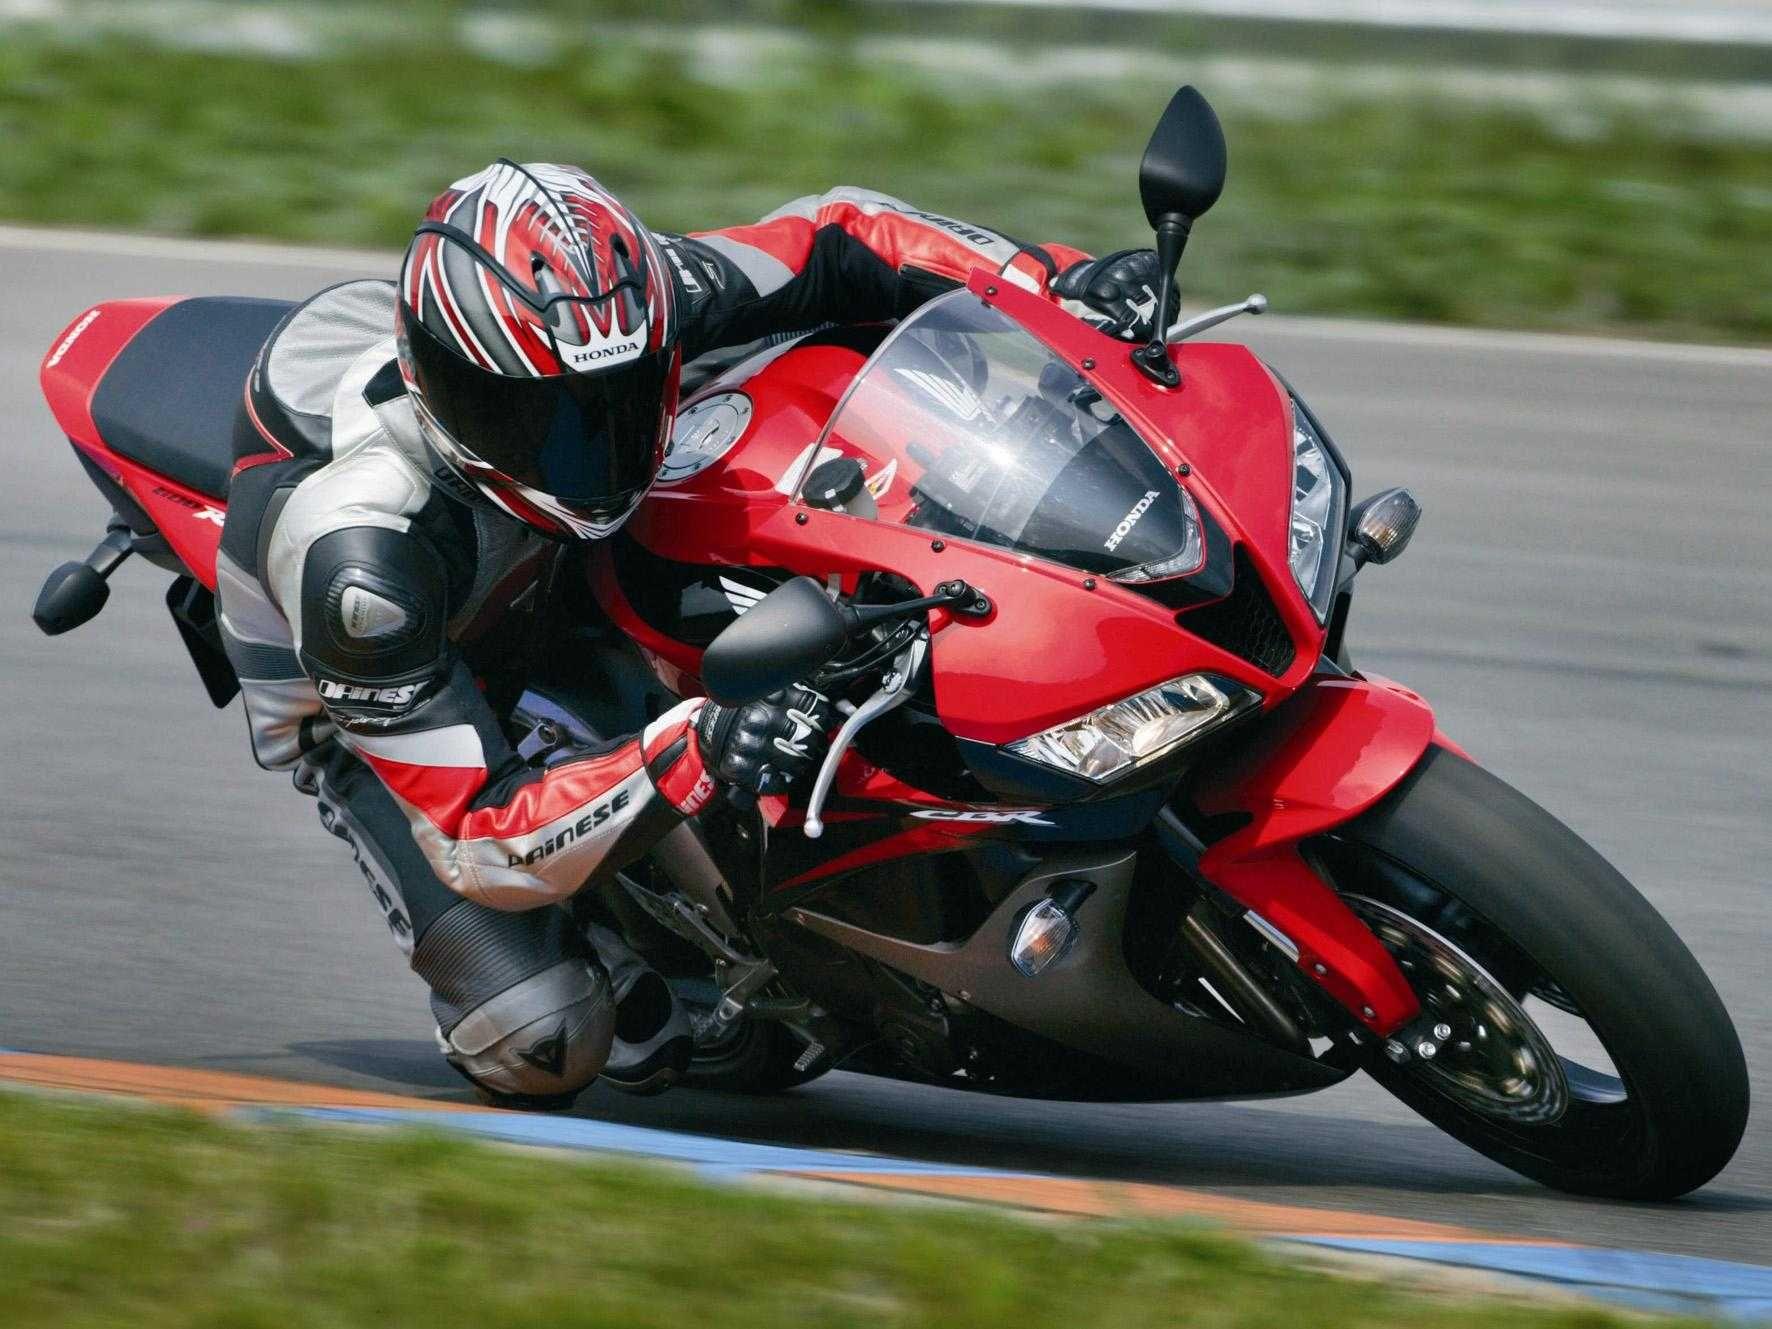 Honda CBR600RR Wallpapers HD Download Bike Honda cbr 600 1772x1329